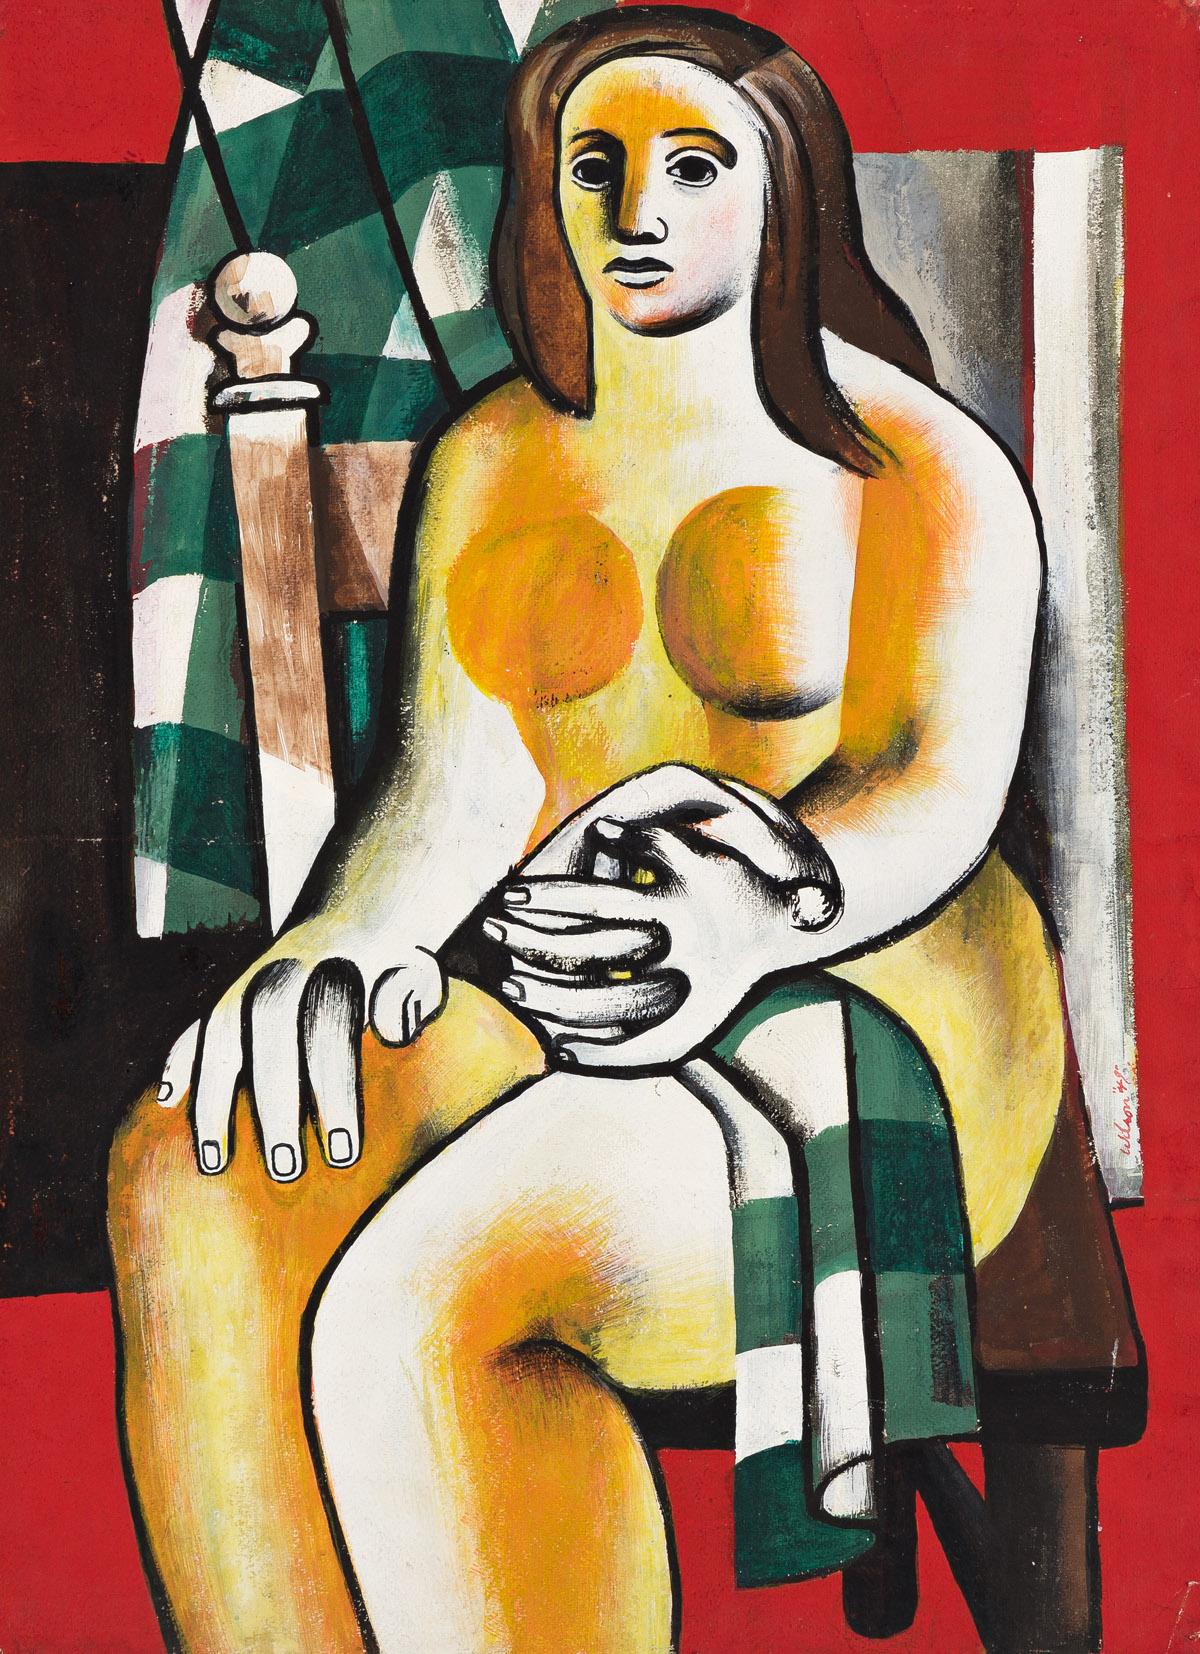 JOHN WOODROW WILSON (1922 - 2015) Green Checked Table Cloth.